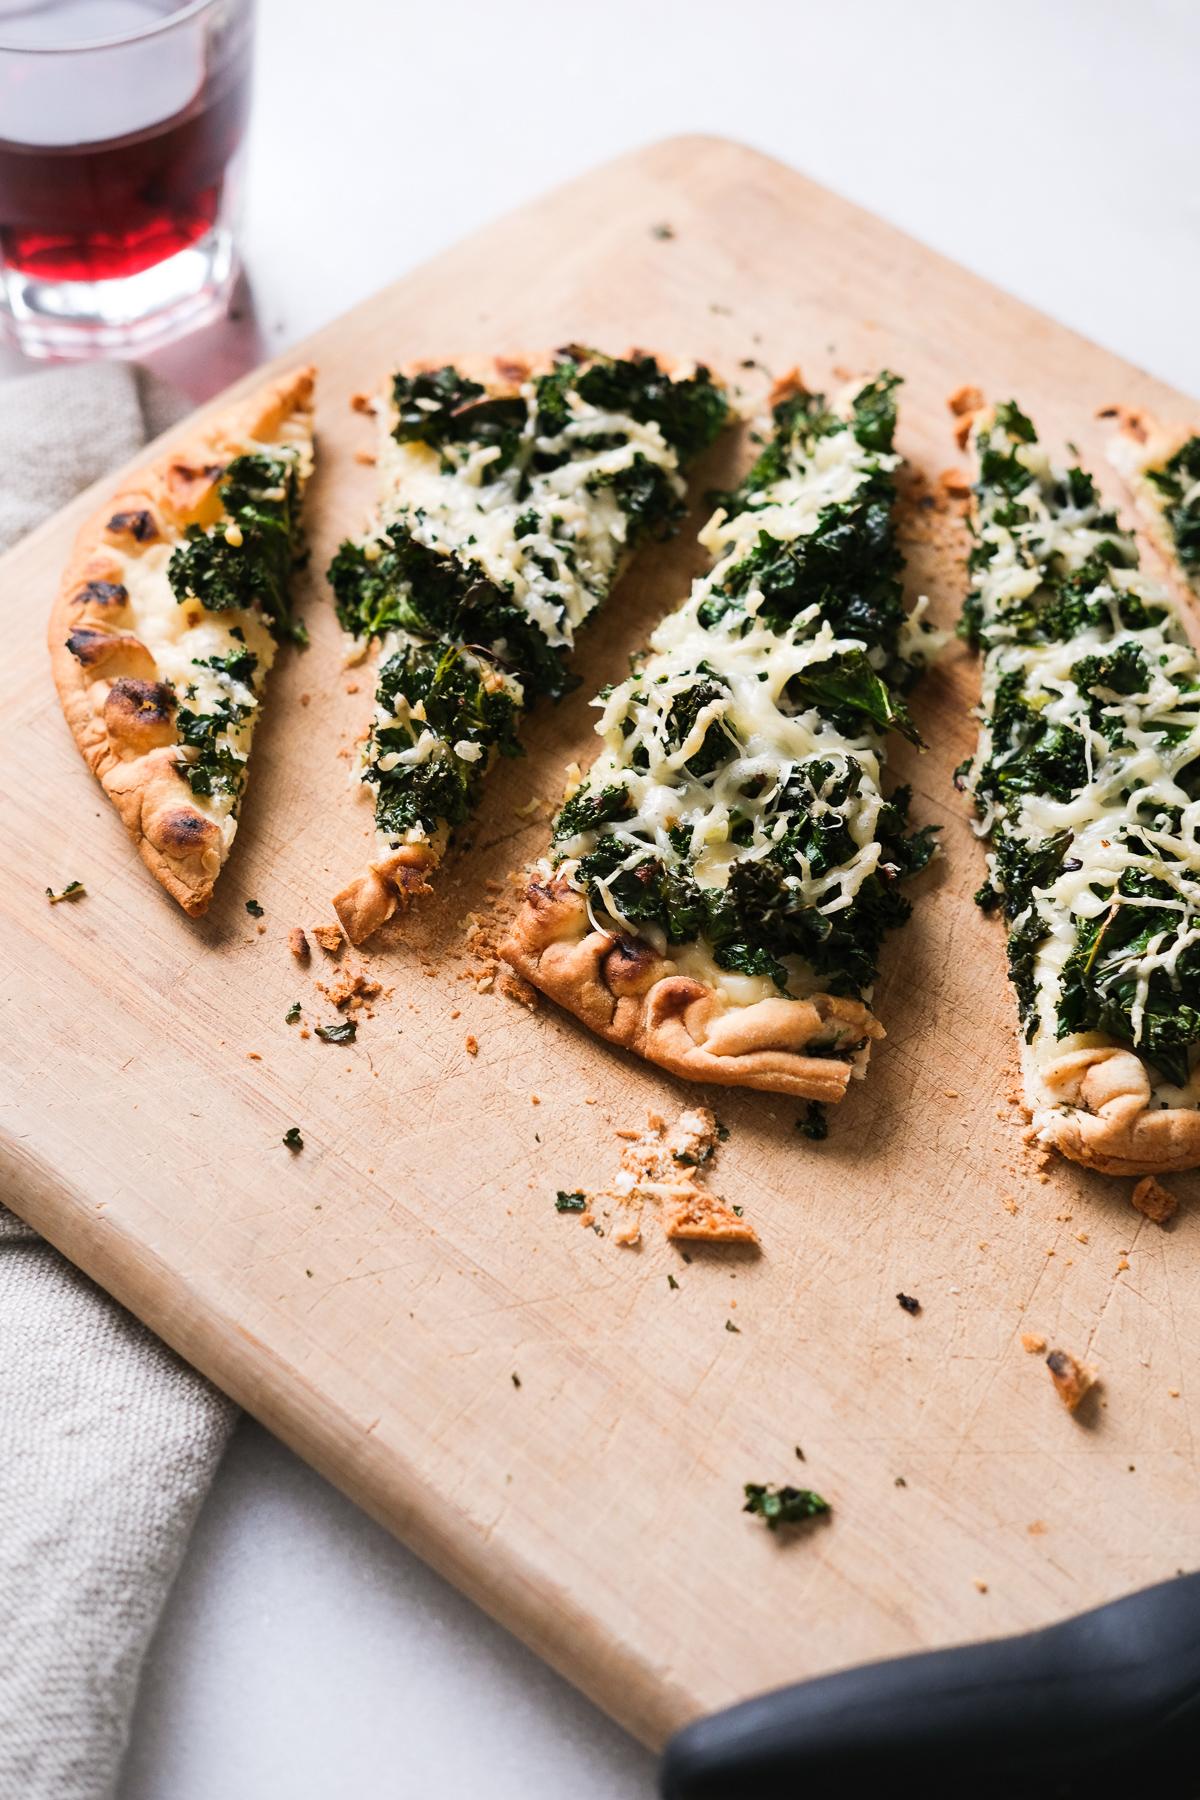 kale parmesan flatbread cut into individual slices